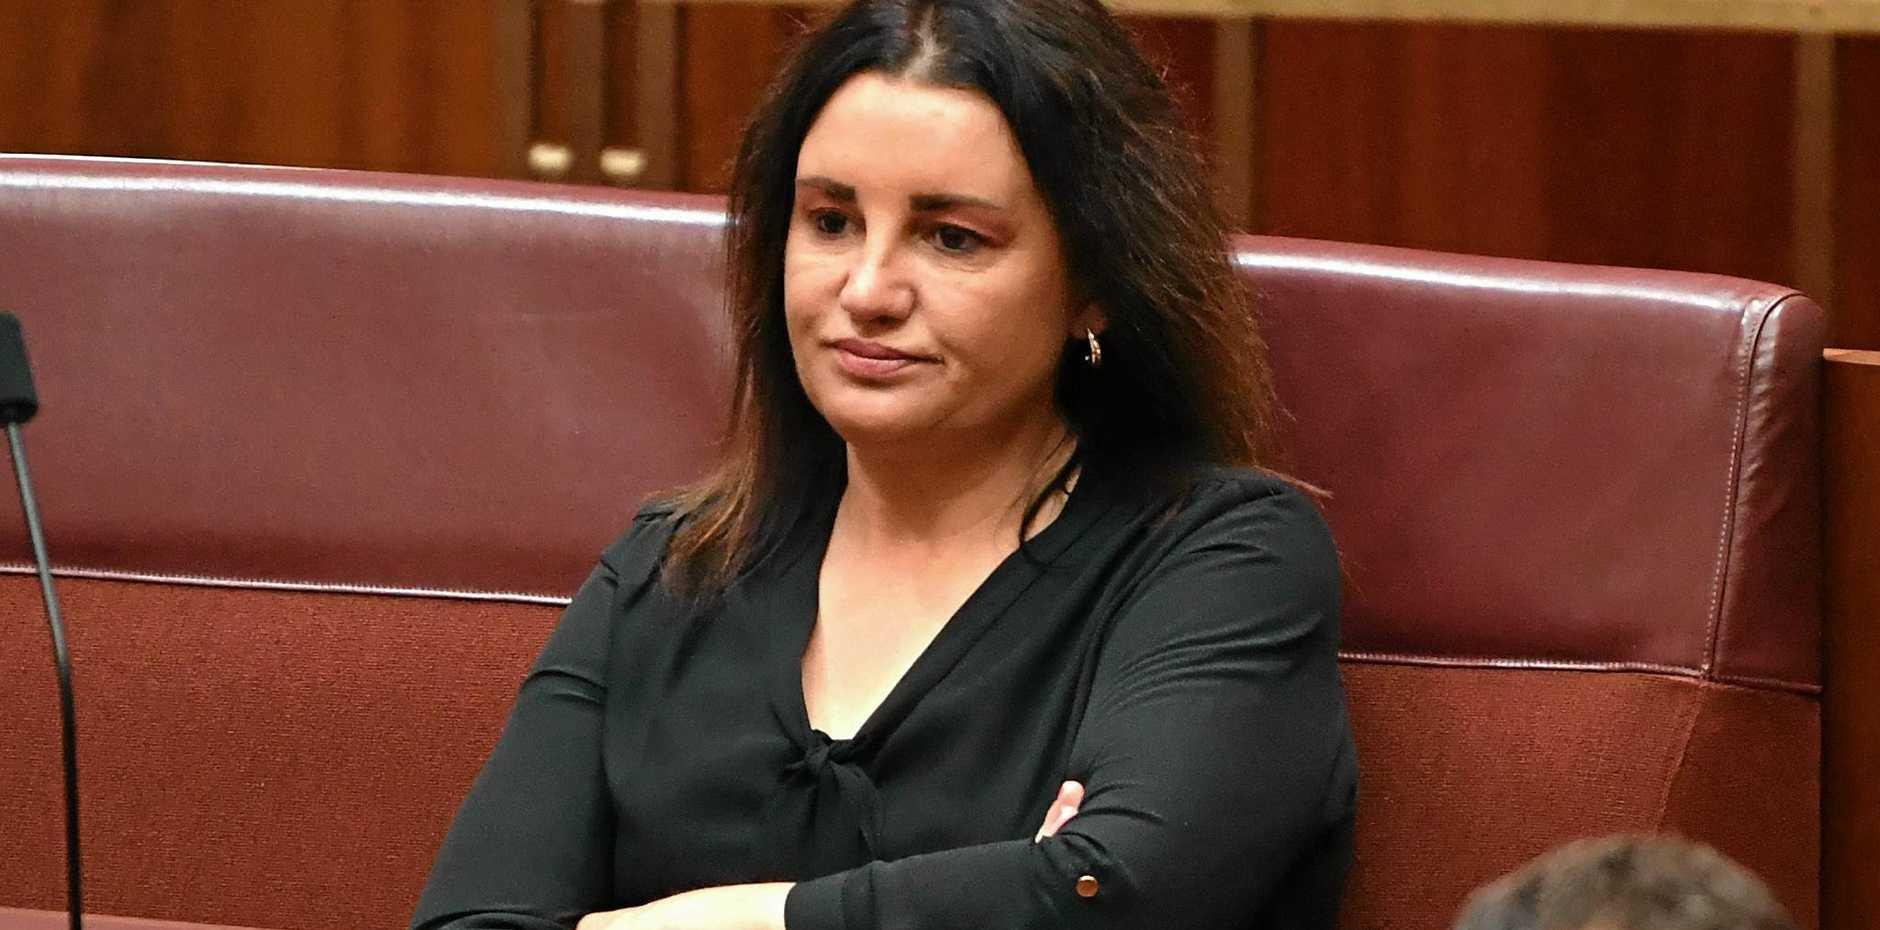 Tasmanian Senator Jacqui Lambie is worth listening to, says Bill Hoffman.